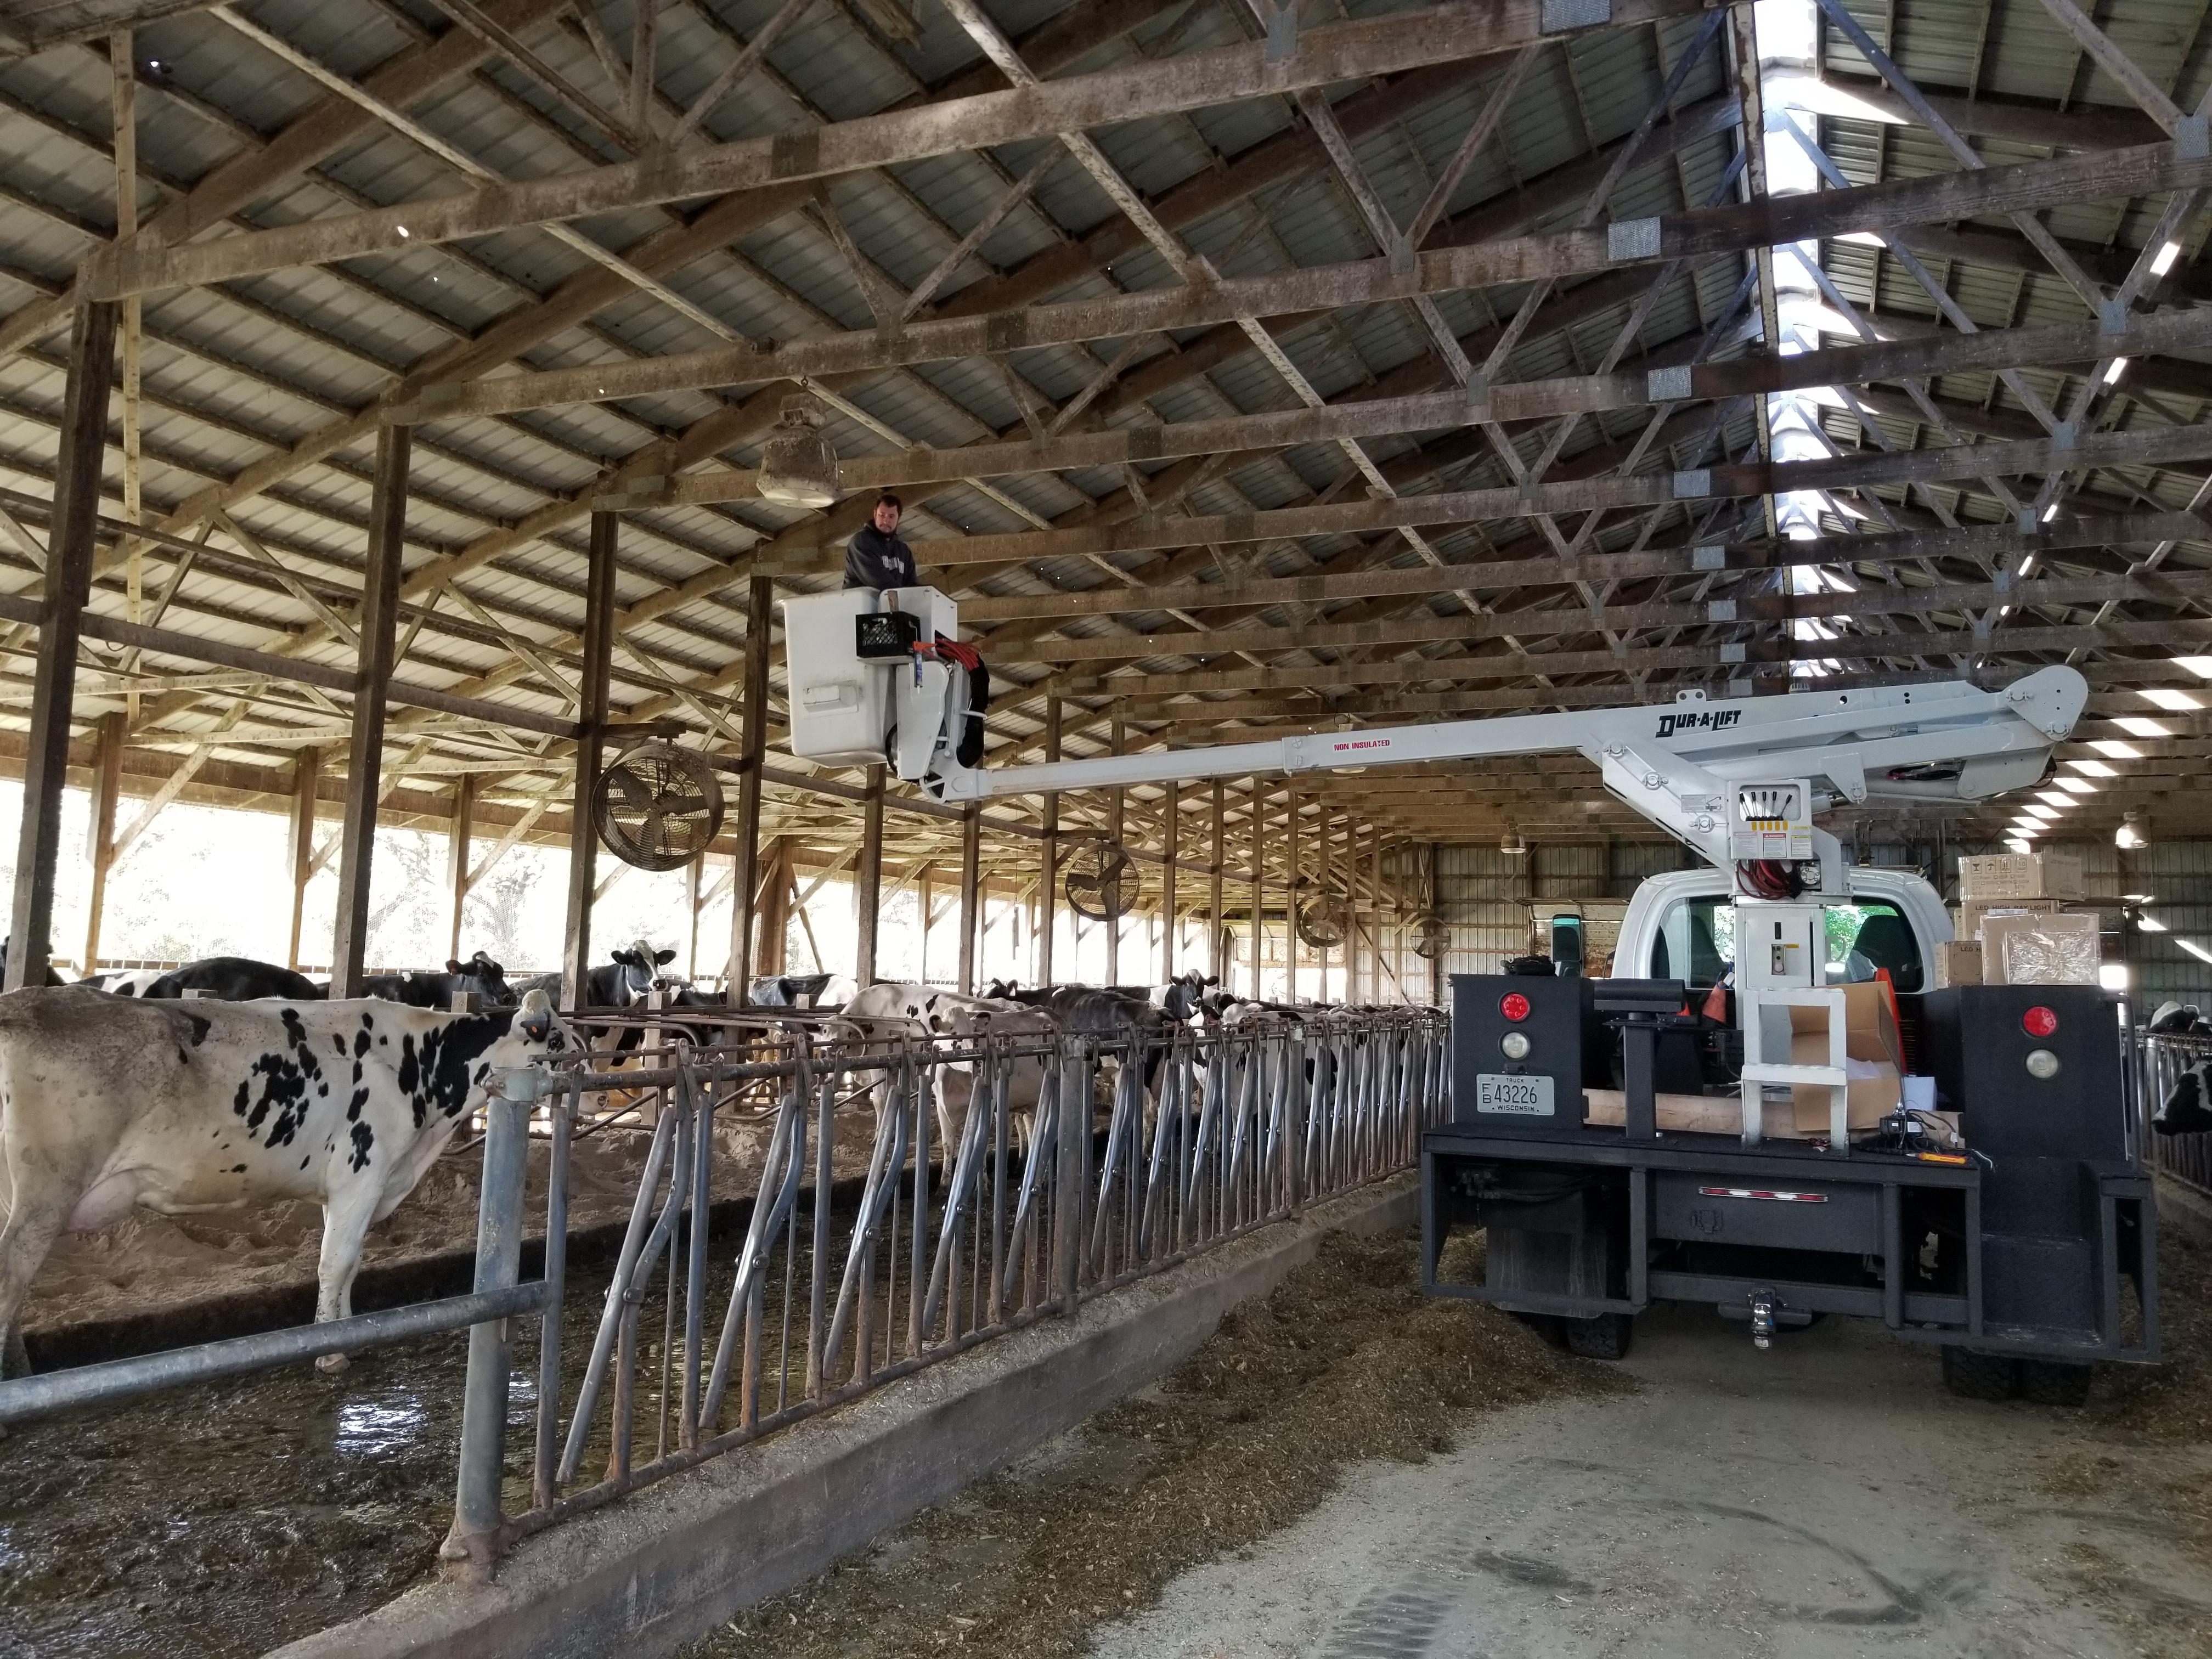 Boom truck dairy barn